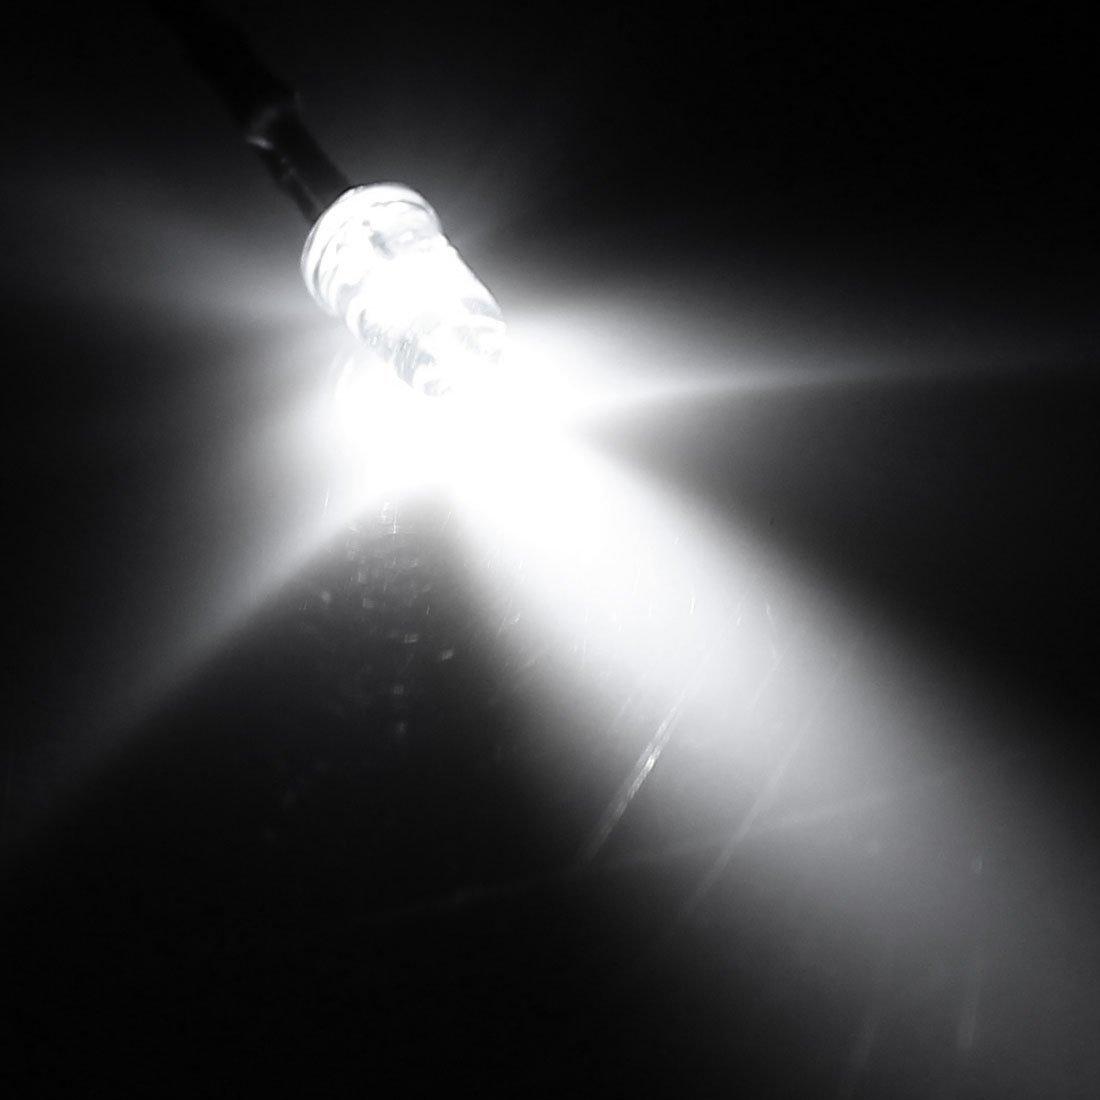 30pcs DC12V 5 mm Dia LED Jaune diodes électroluminescentes